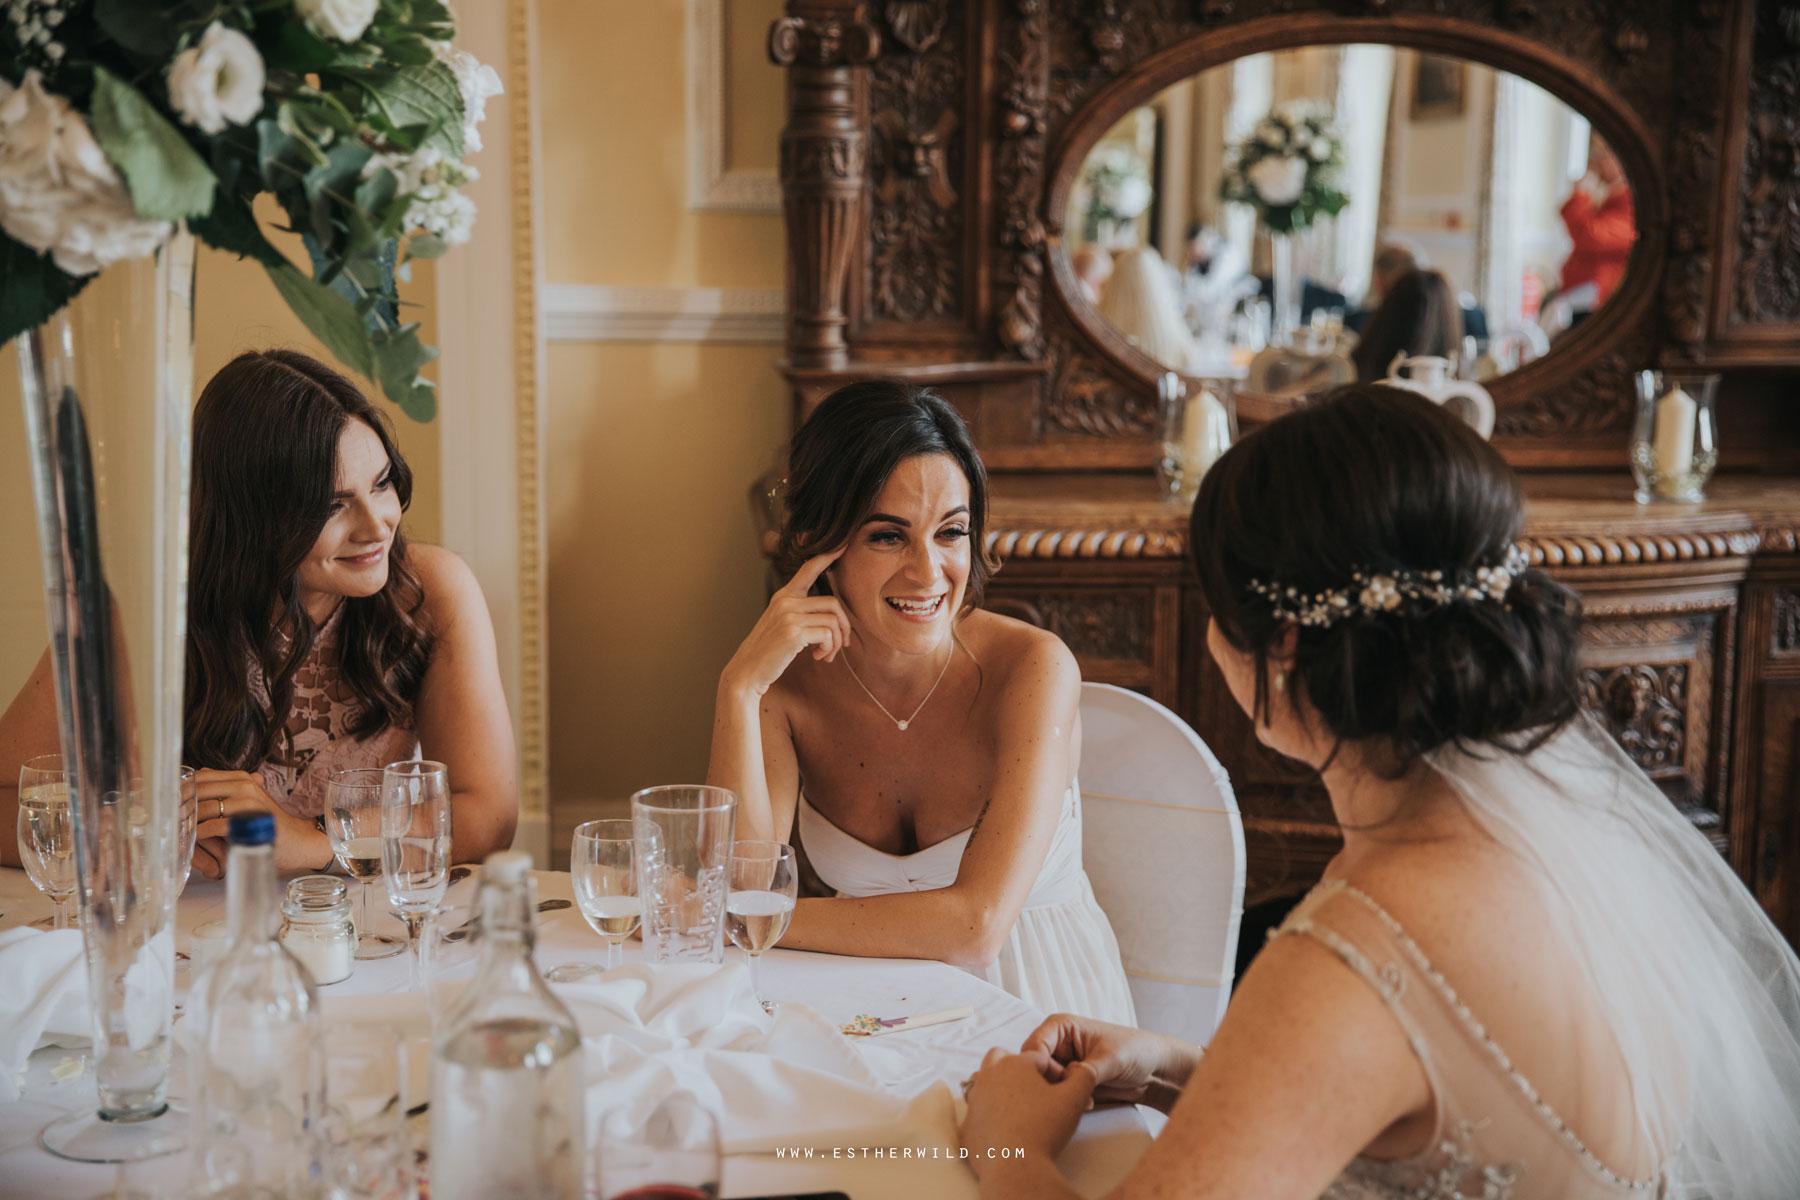 Lynford_Hall_Wedding_Thetford_Mundford_Esther_Wild_Photographer_IMG_2403.jpg